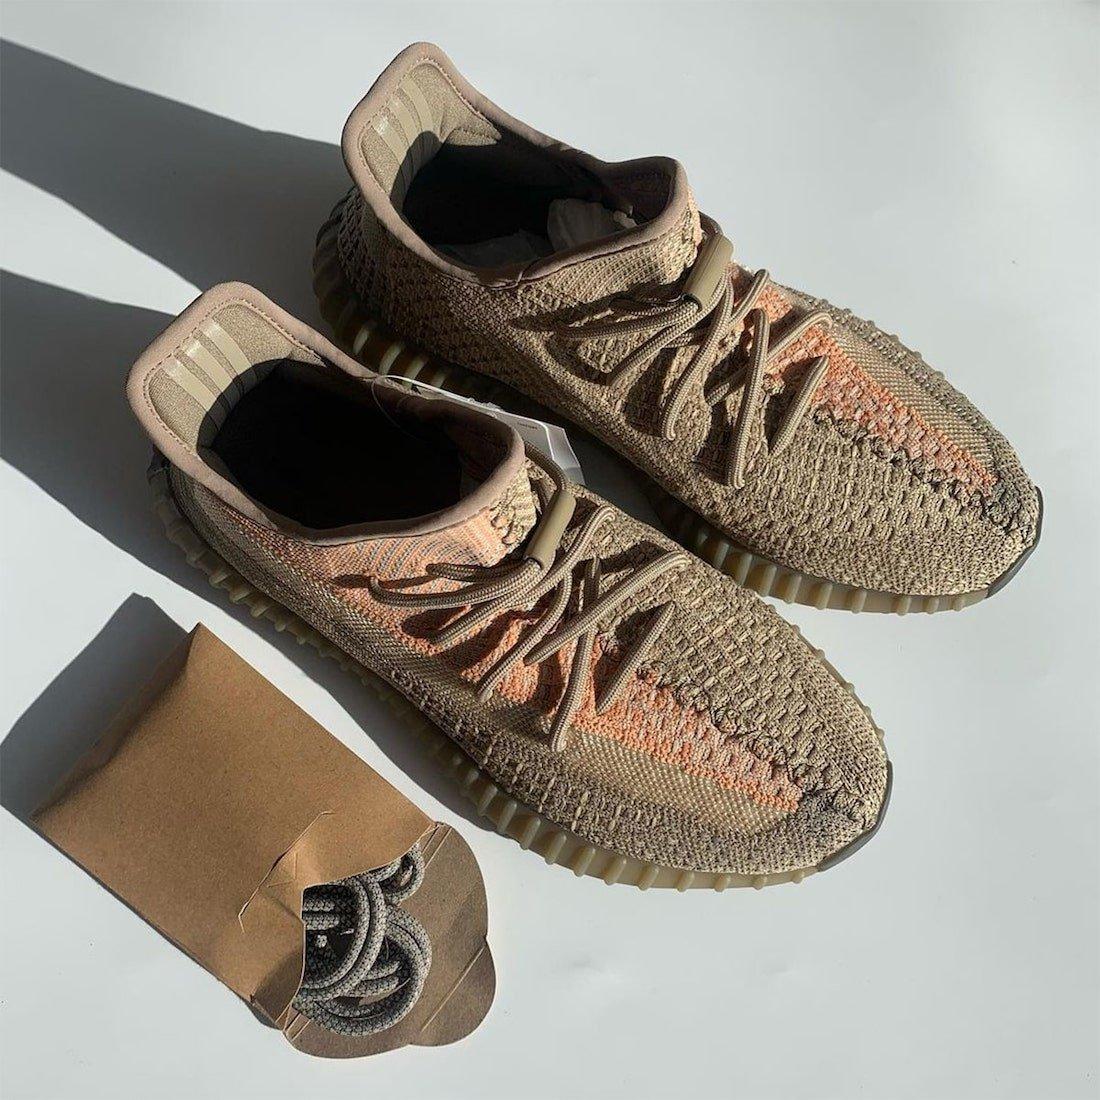 Sand Taupe adidas Yeezy Boost 350 V2 Eliada Release